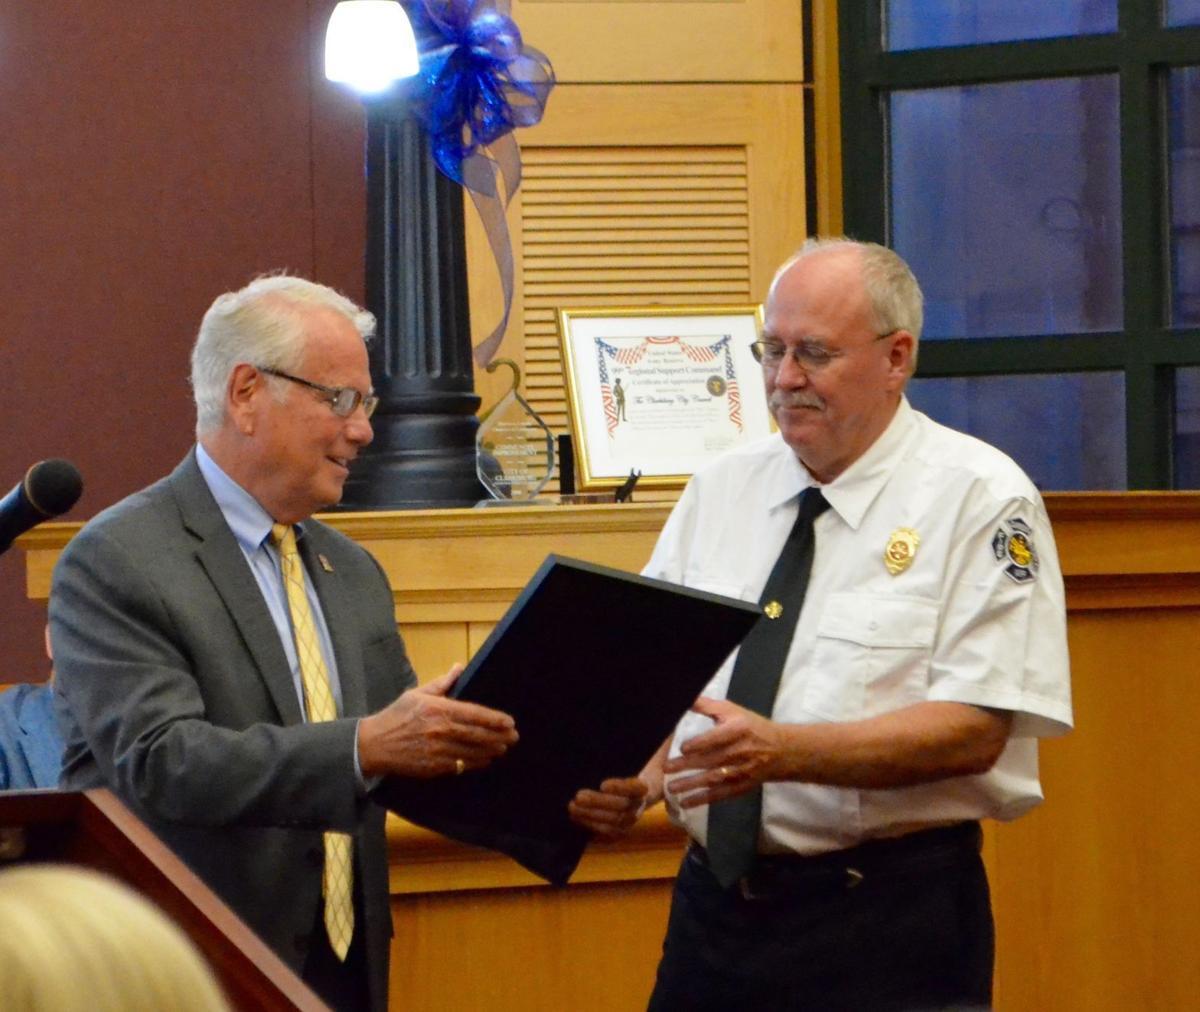 Clarksburg Fire Chief